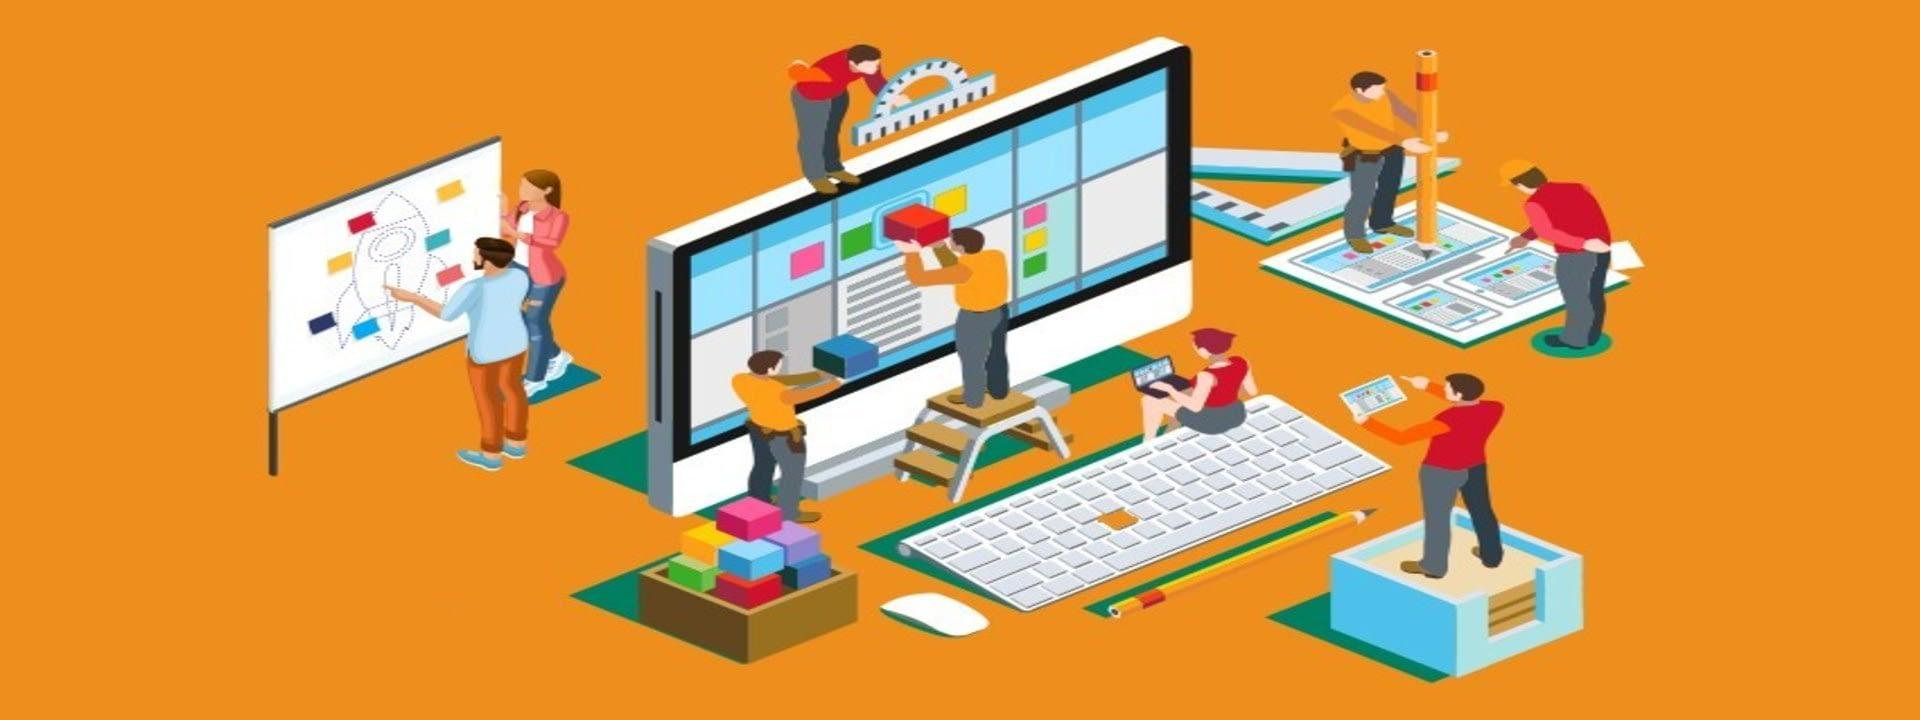 Web Design and Development